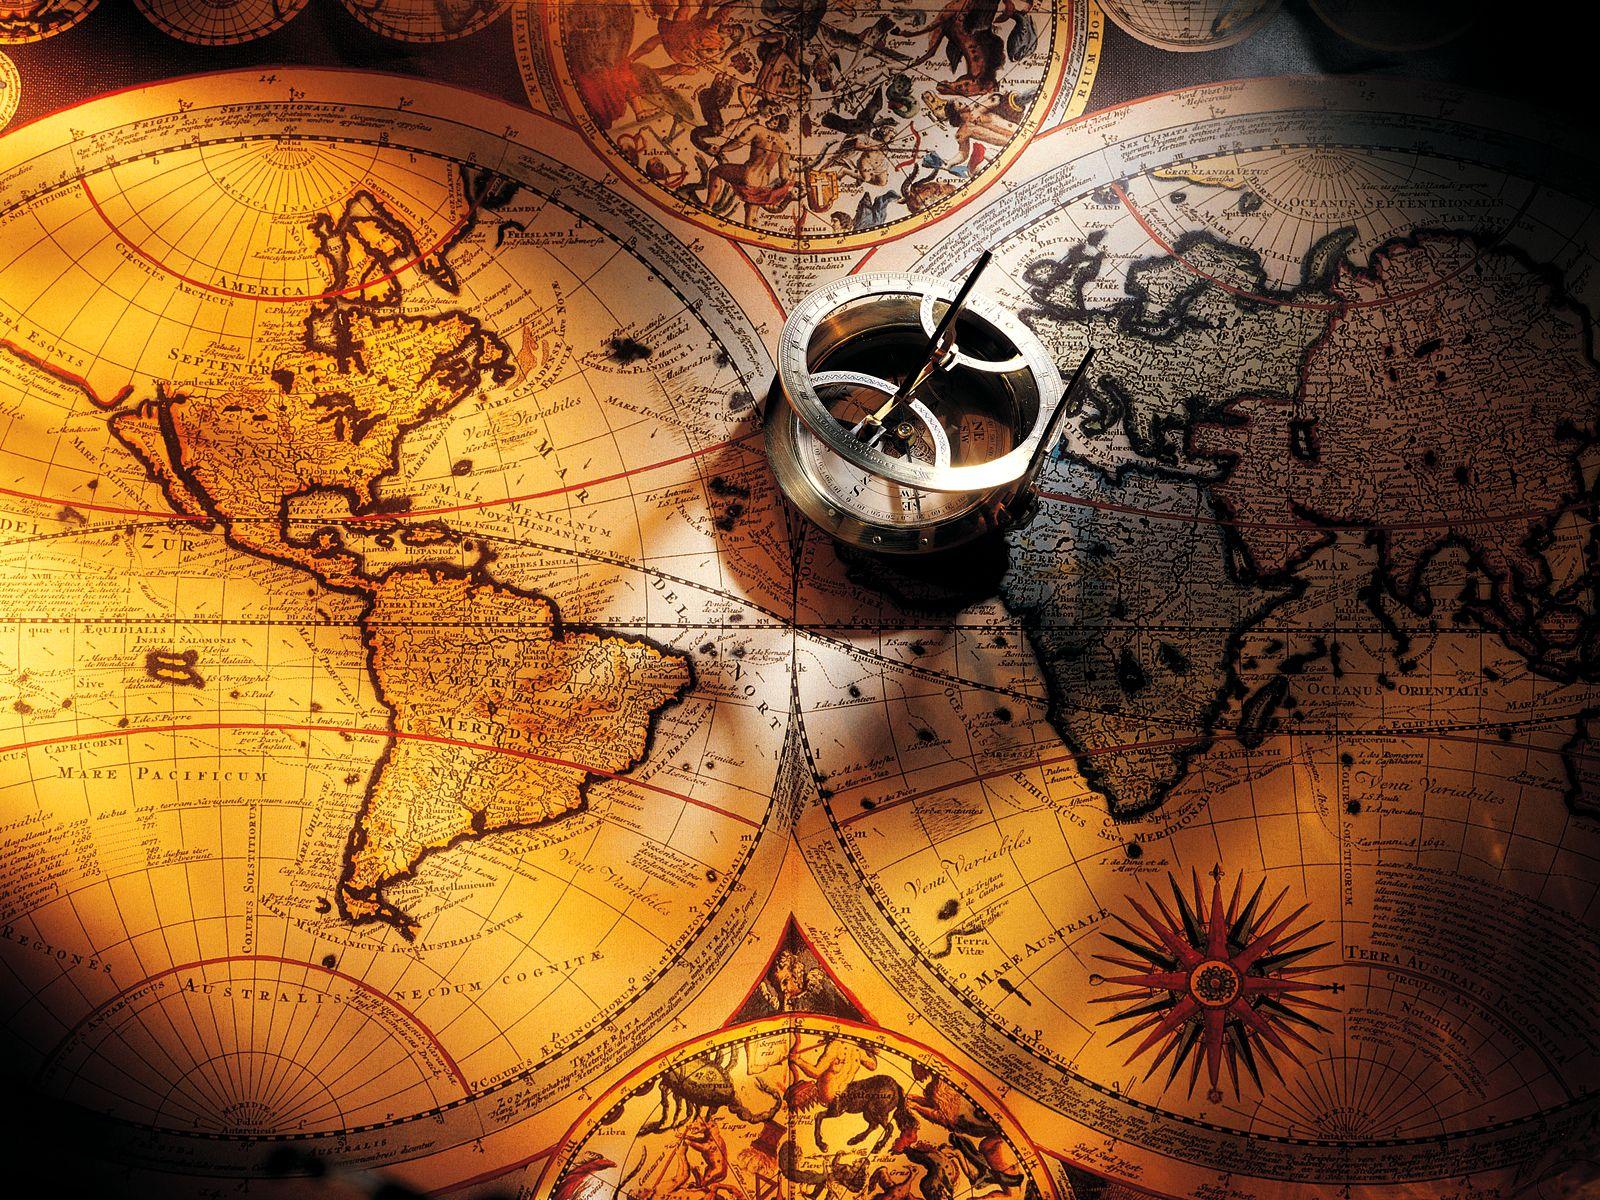 Falling In Reverse Wallpaper Hd Old World Map Atlas Pinterest Tatt And Tattoo